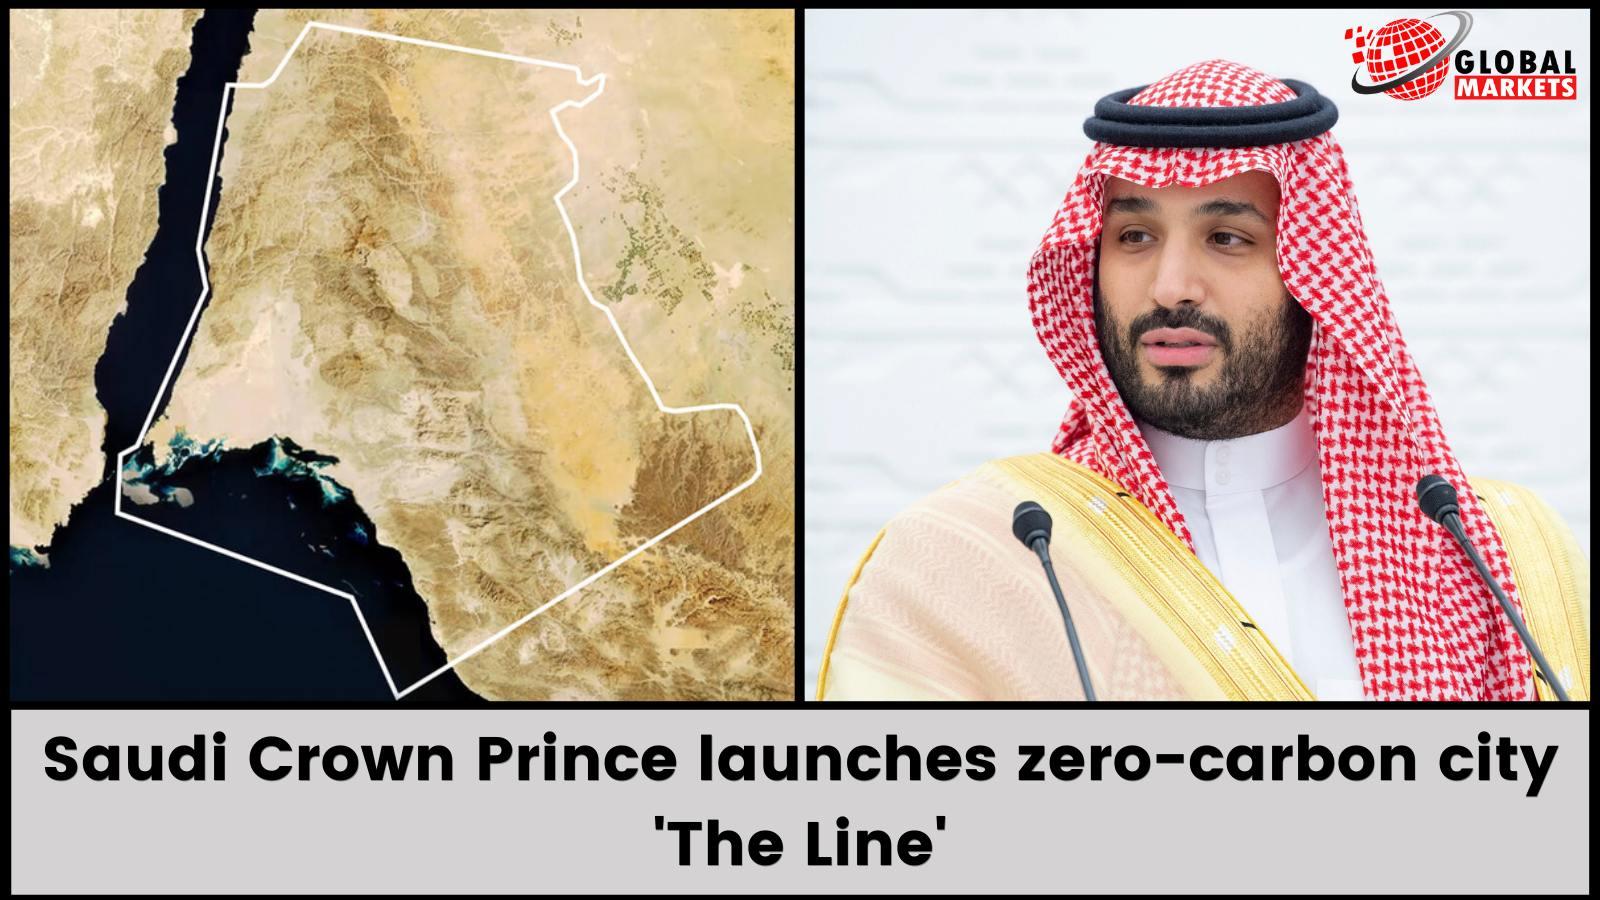 Saudi Crown Prince launches zero-carbon city - 'The Line'